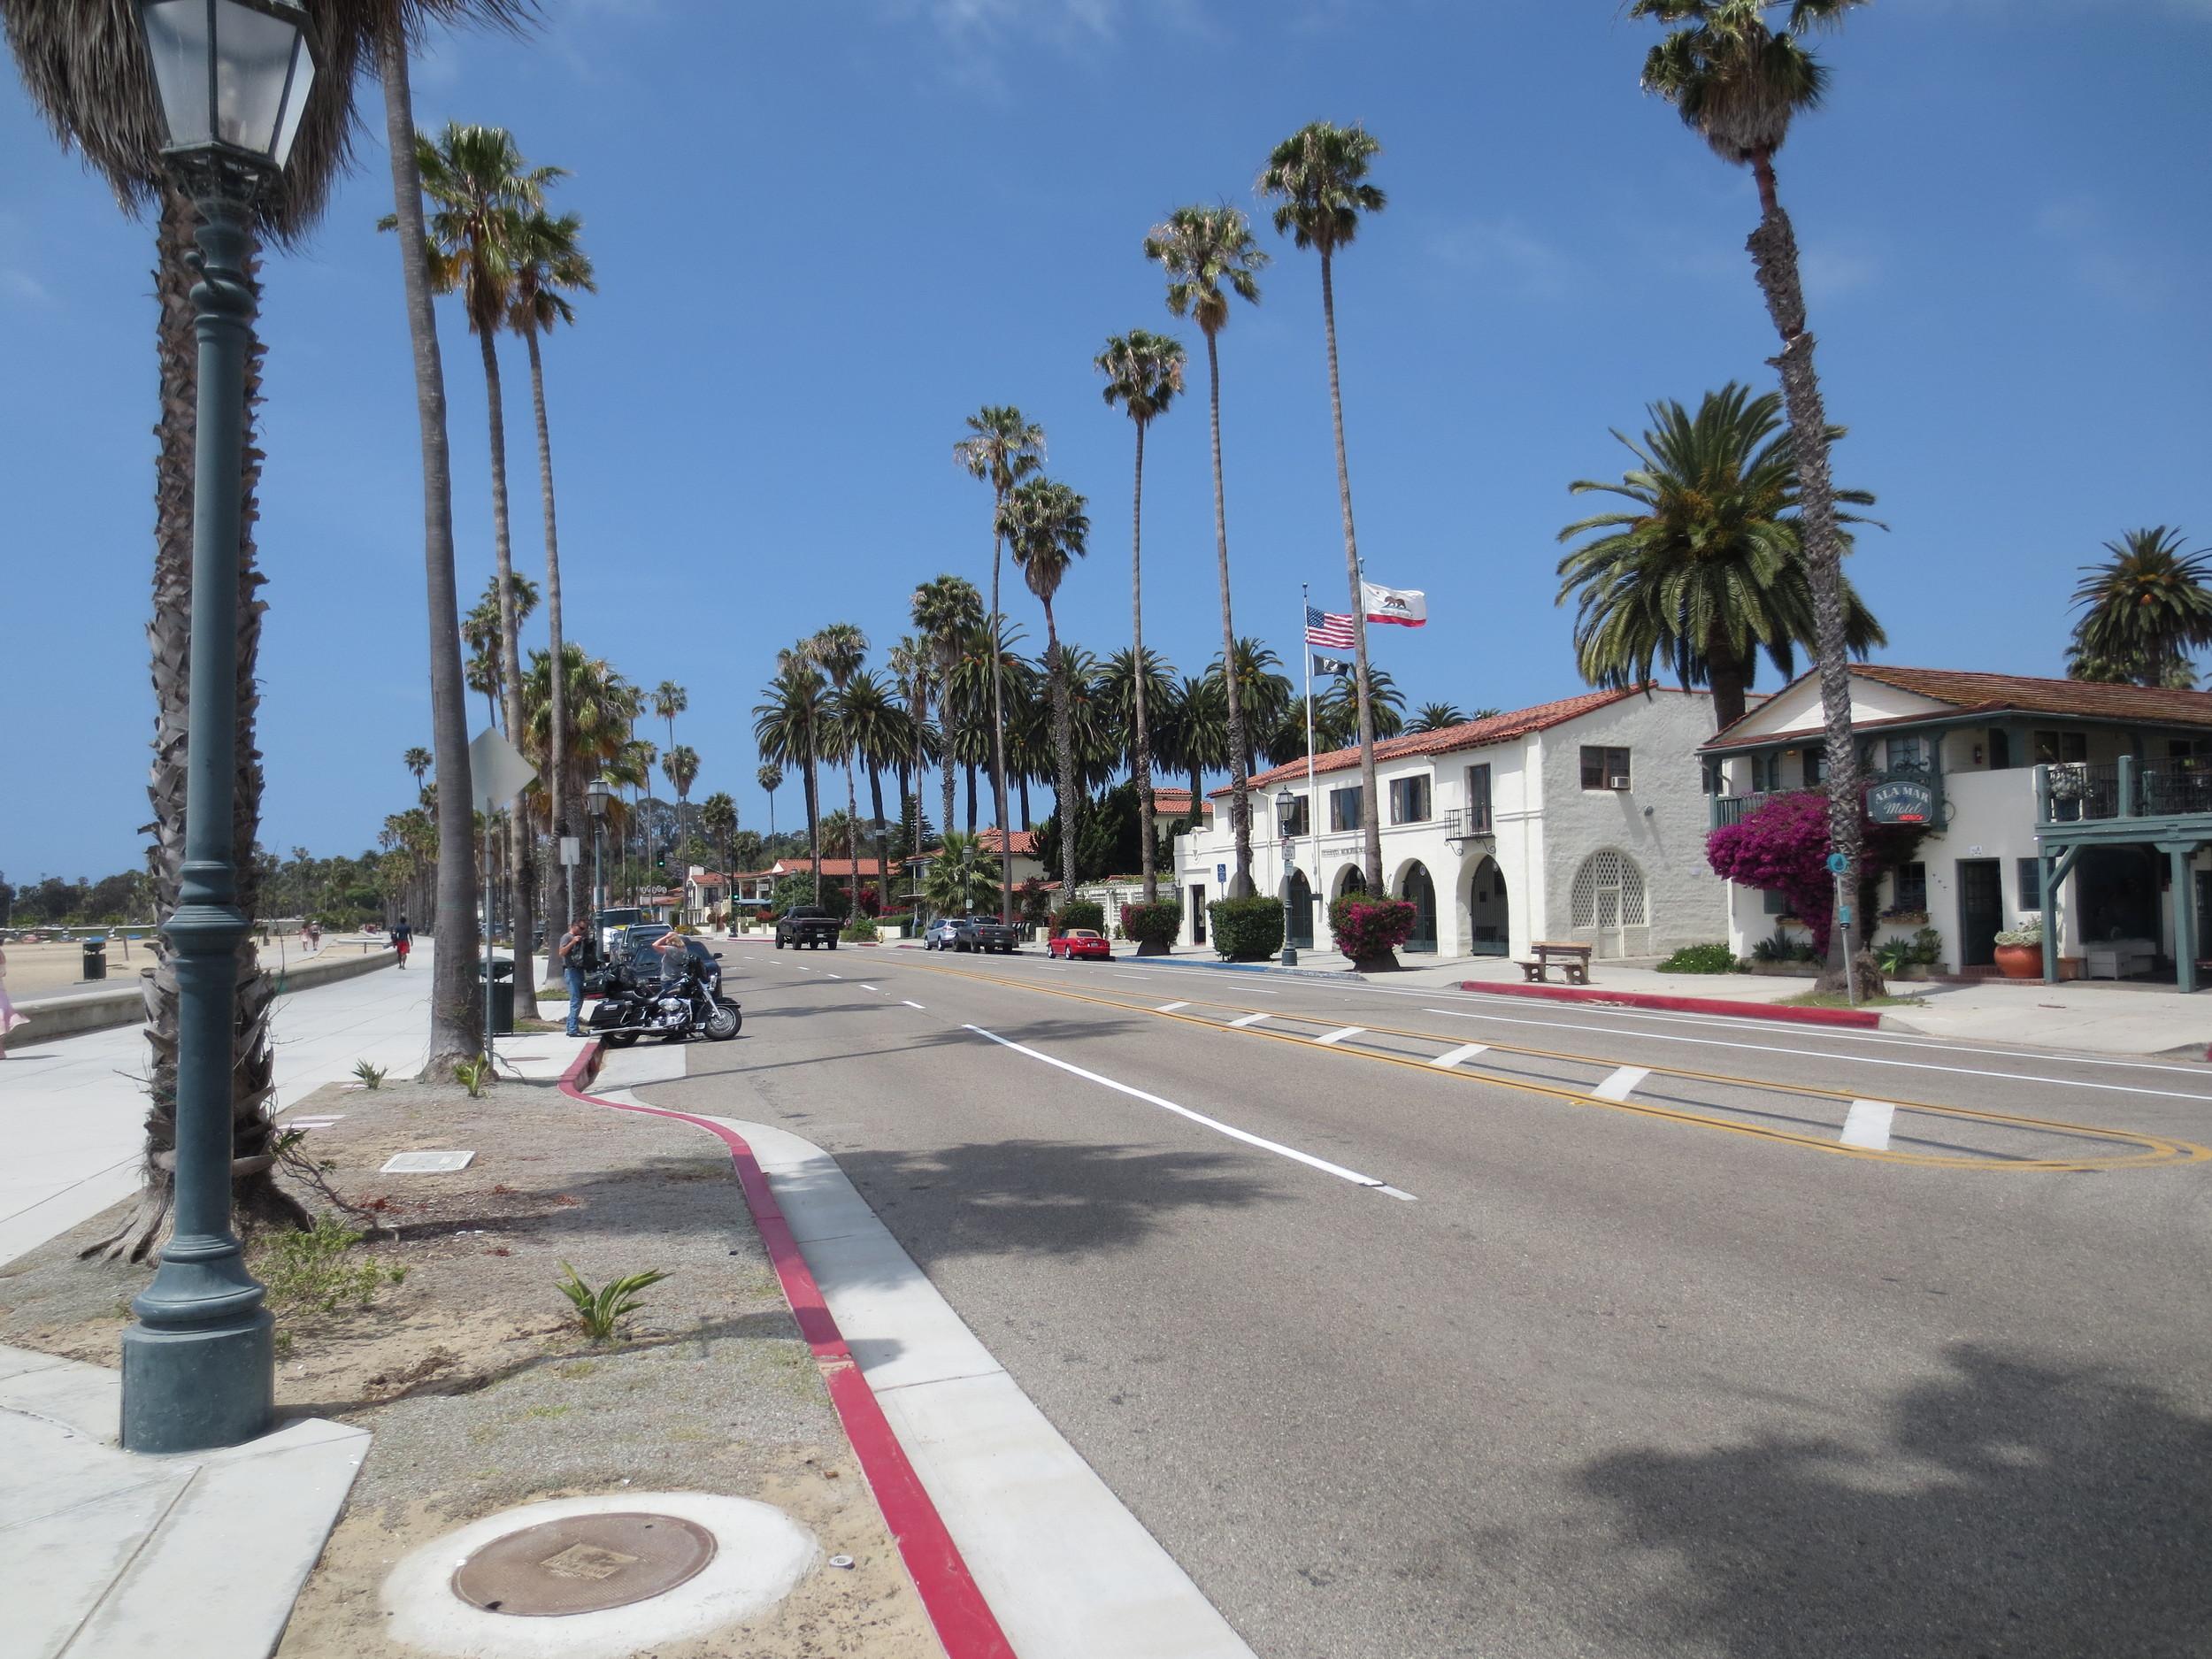 California Coastal Road Trip ? Santa Barbara, Solvang, & Pismo Beach | Sea of Atlas